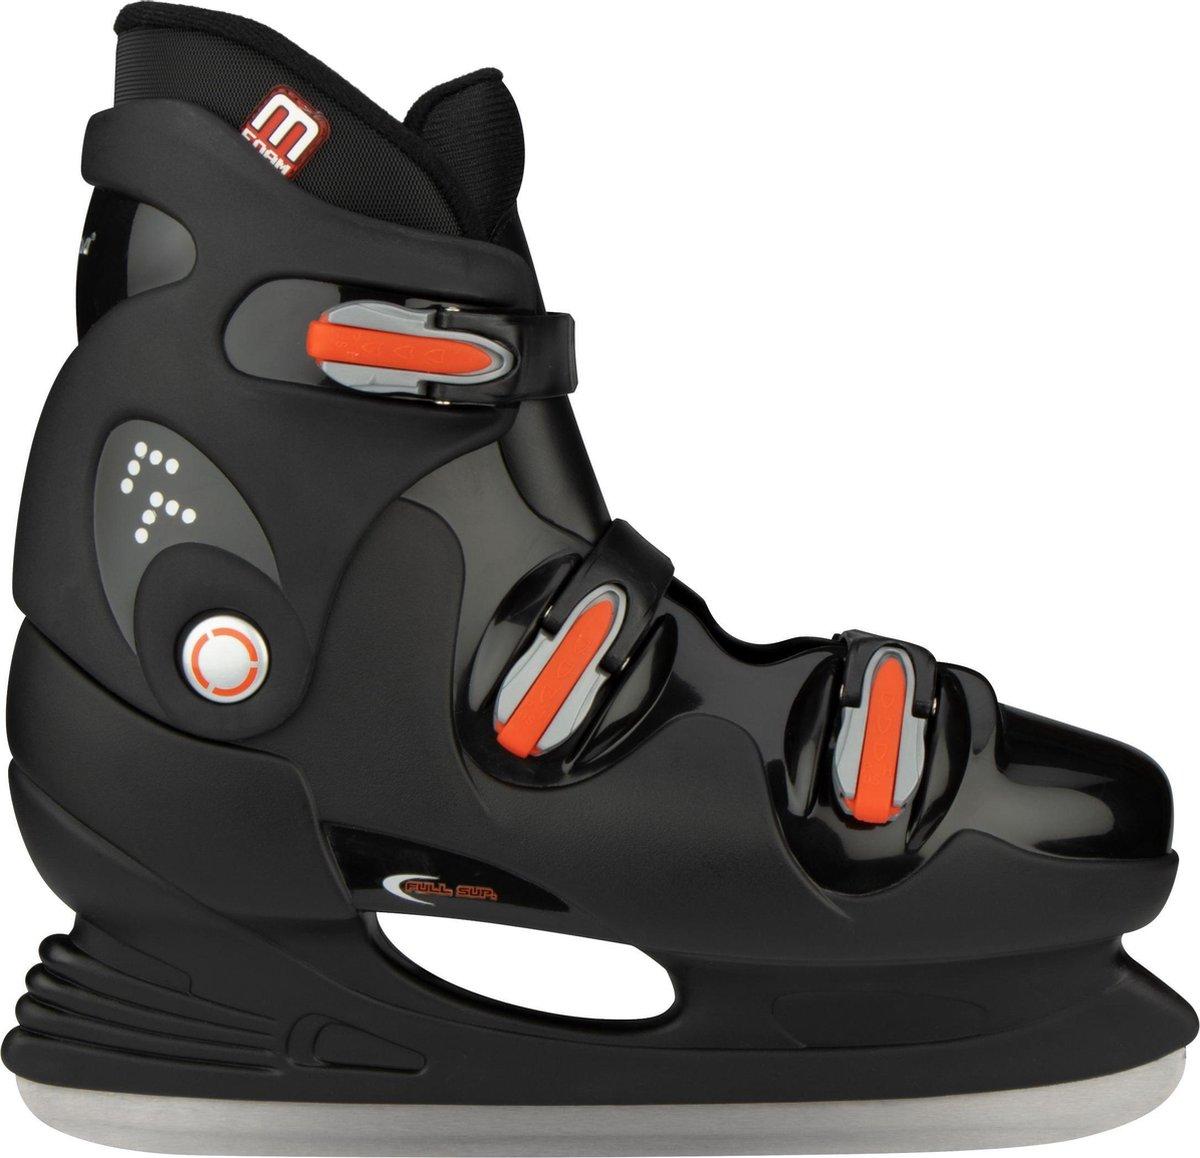 Nijdam IJshockeyschaats - Hardboot - Zwart/Zilver/Rood - 36